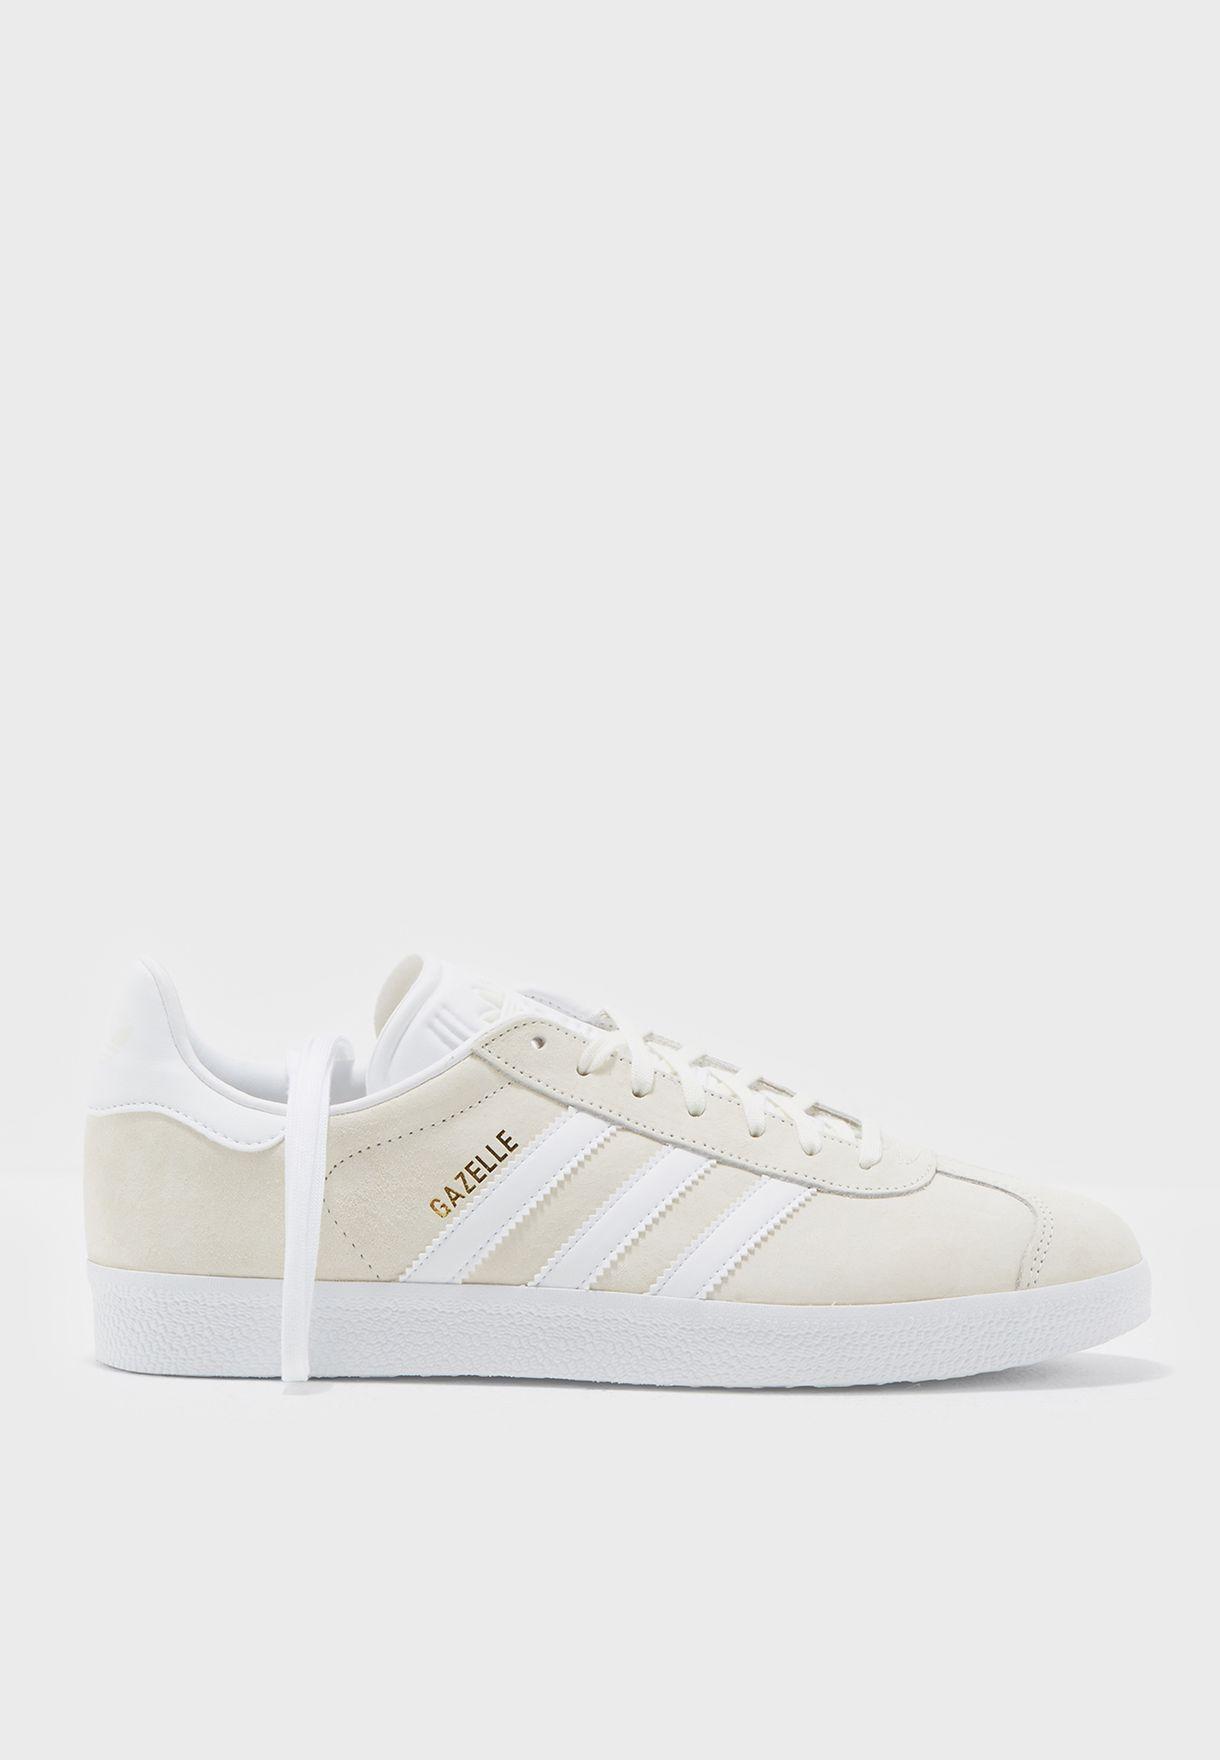 new style 724fb f426b Shop adidas Originals neutrals Gazelle Sneaker BB5475 for Me